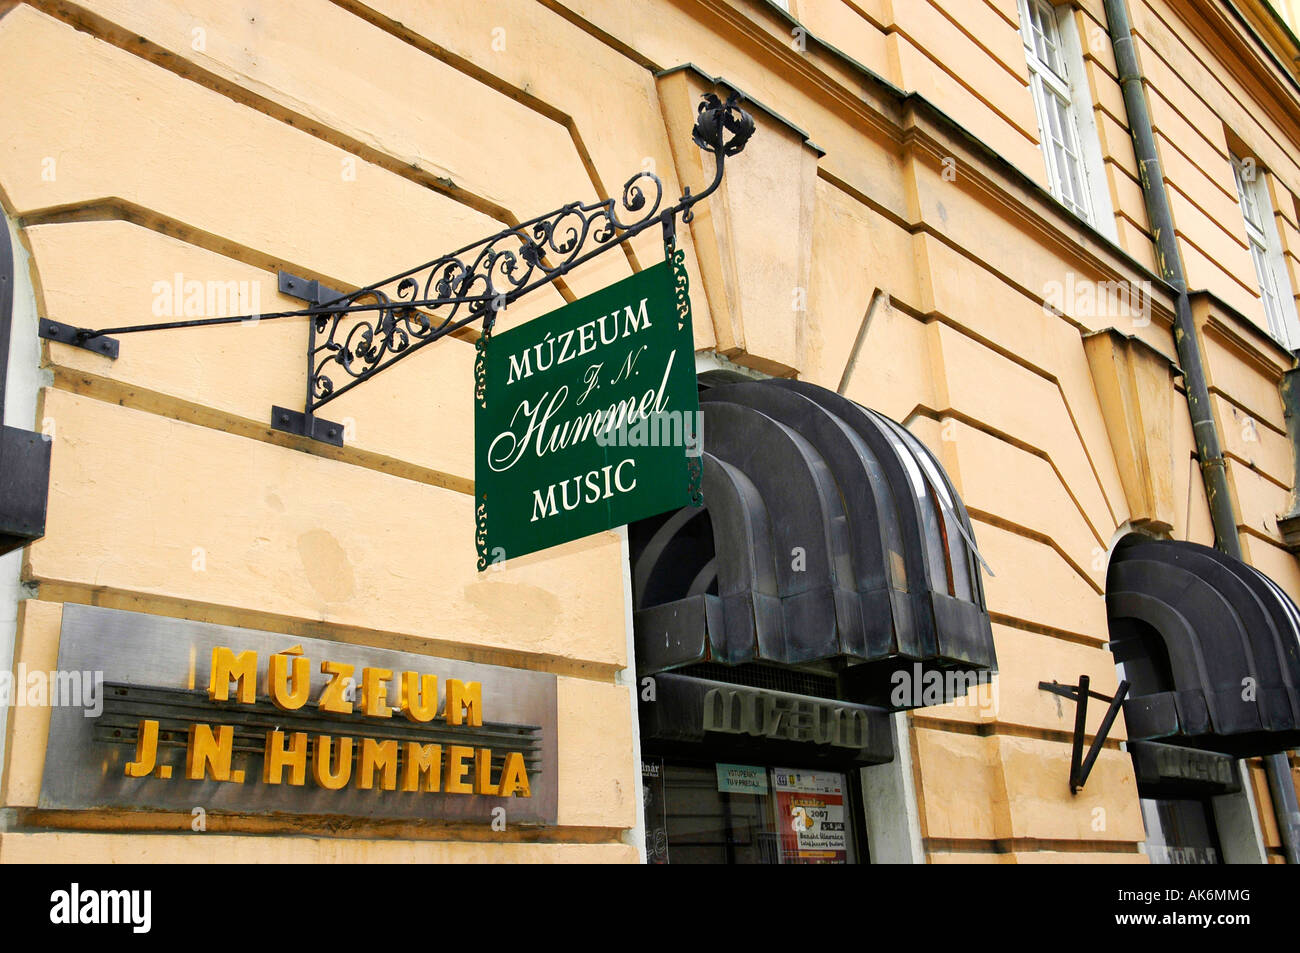 Museum J. N. Hummel / Bratislava - Stock Image